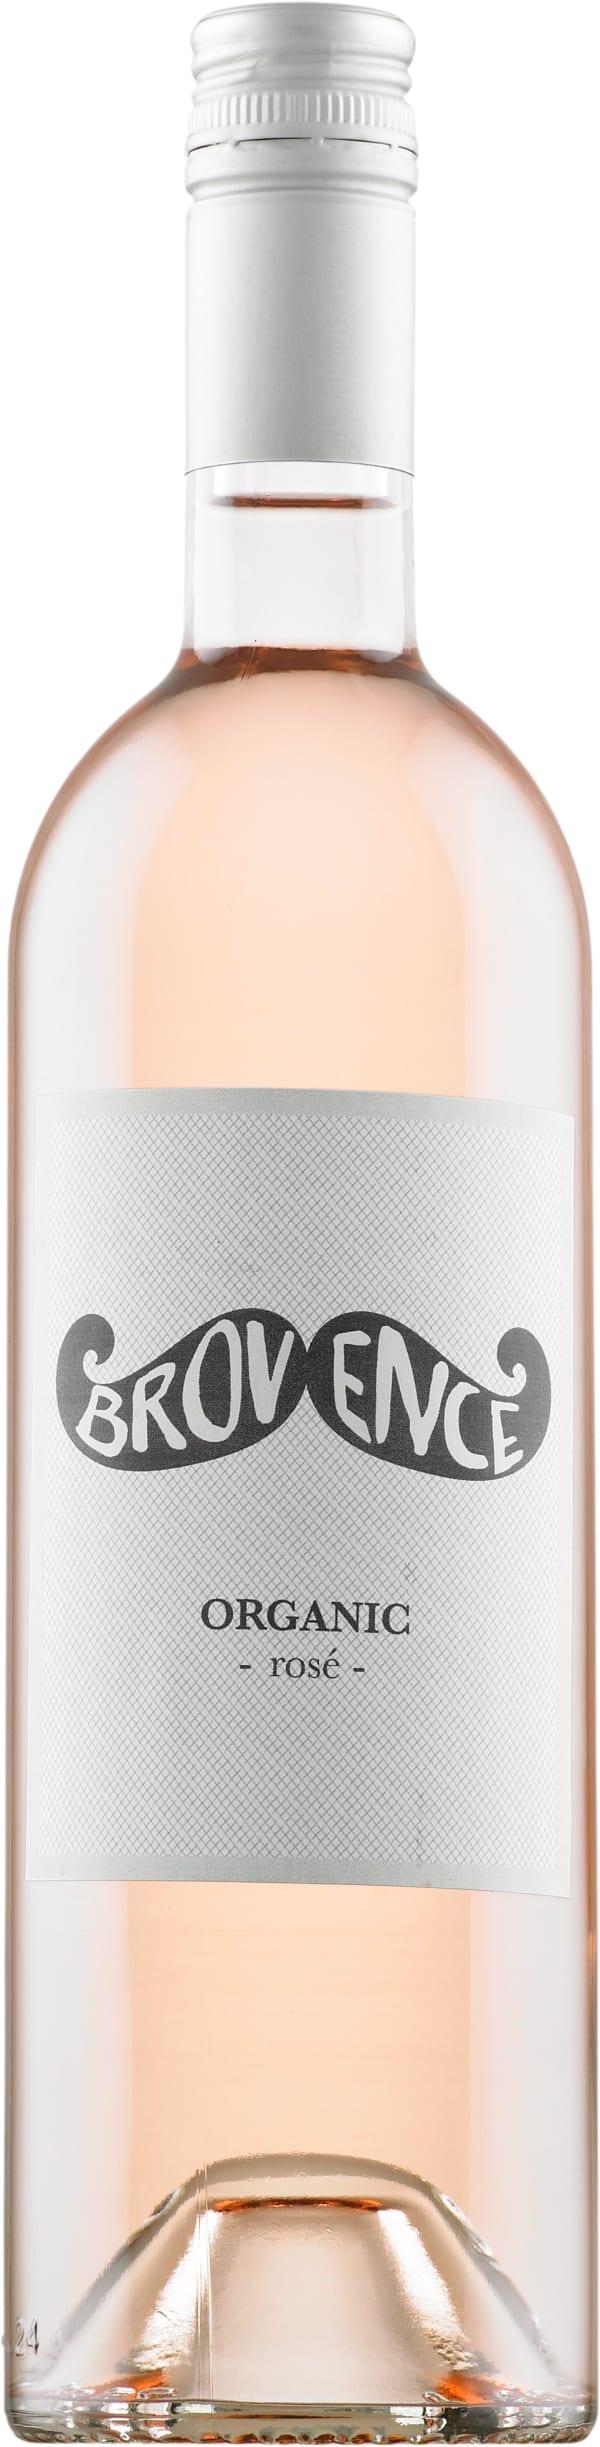 Brovence Organic Rosé 2017